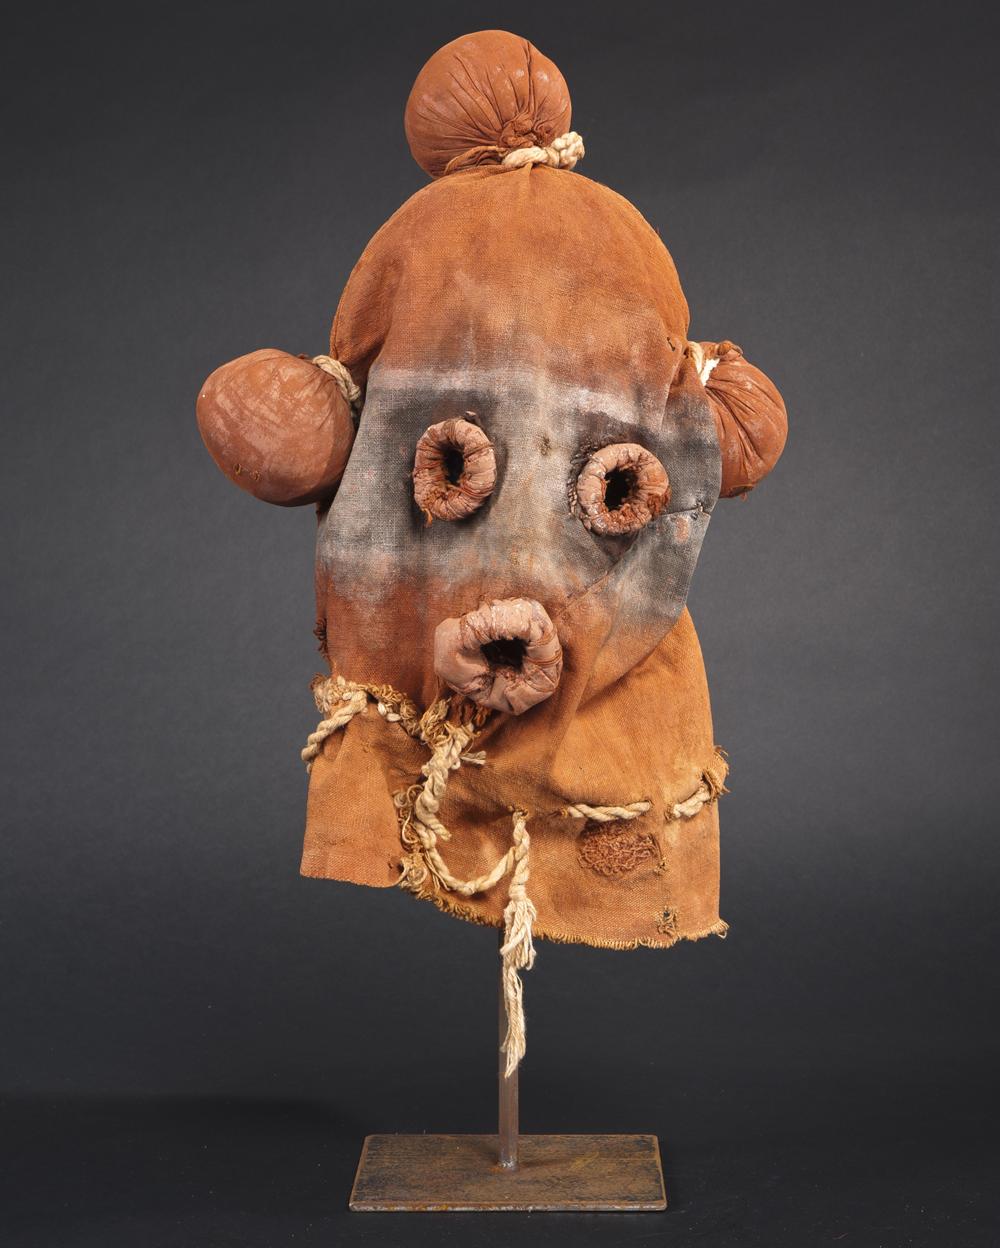 Koyemsi mask from the Hopi tribe, Arizona, 1920-1930.